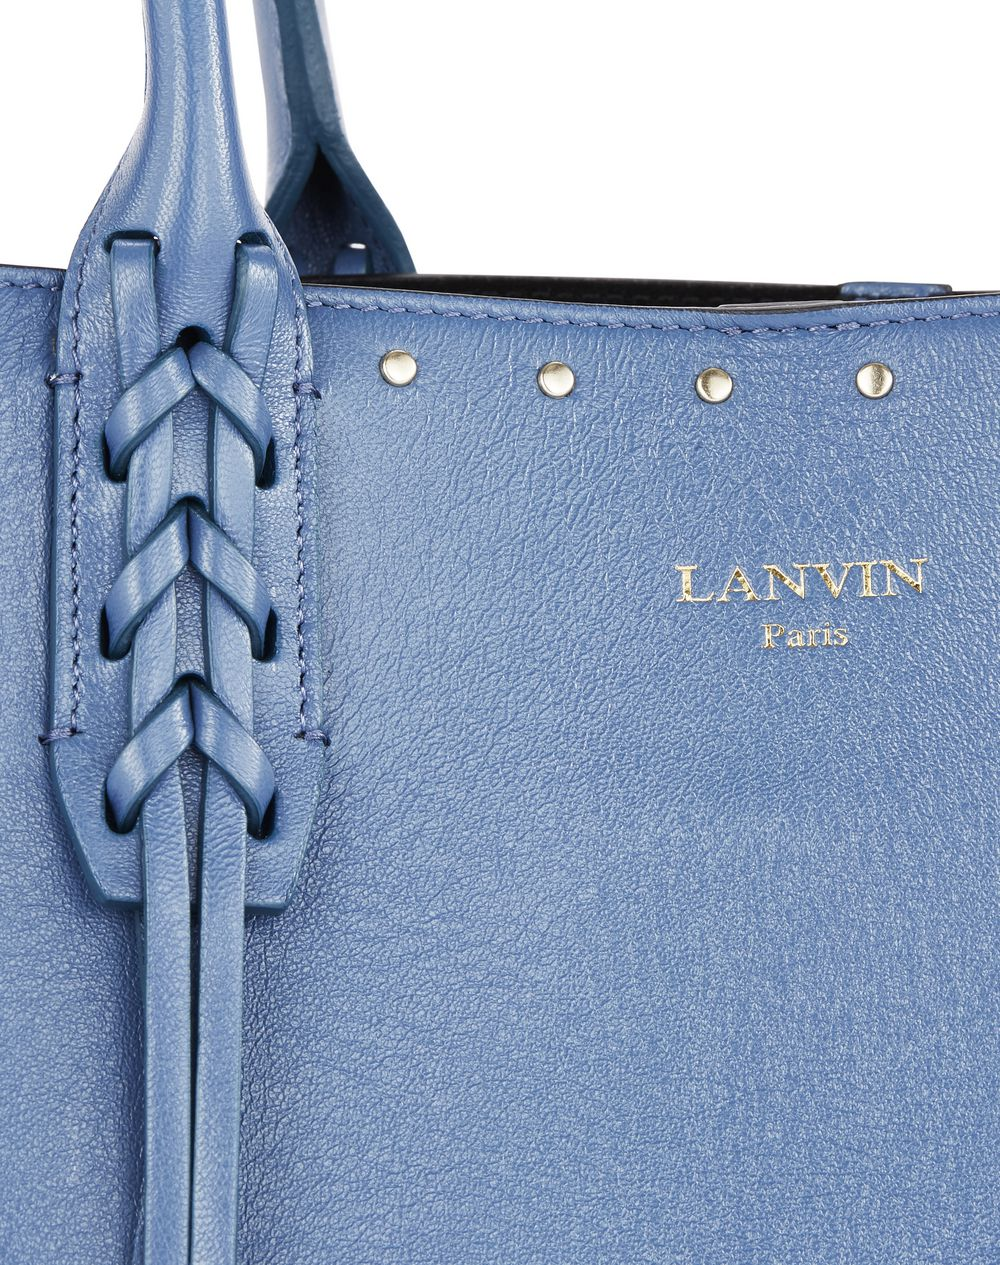 SMALL SHOPPER BAG - Lanvin